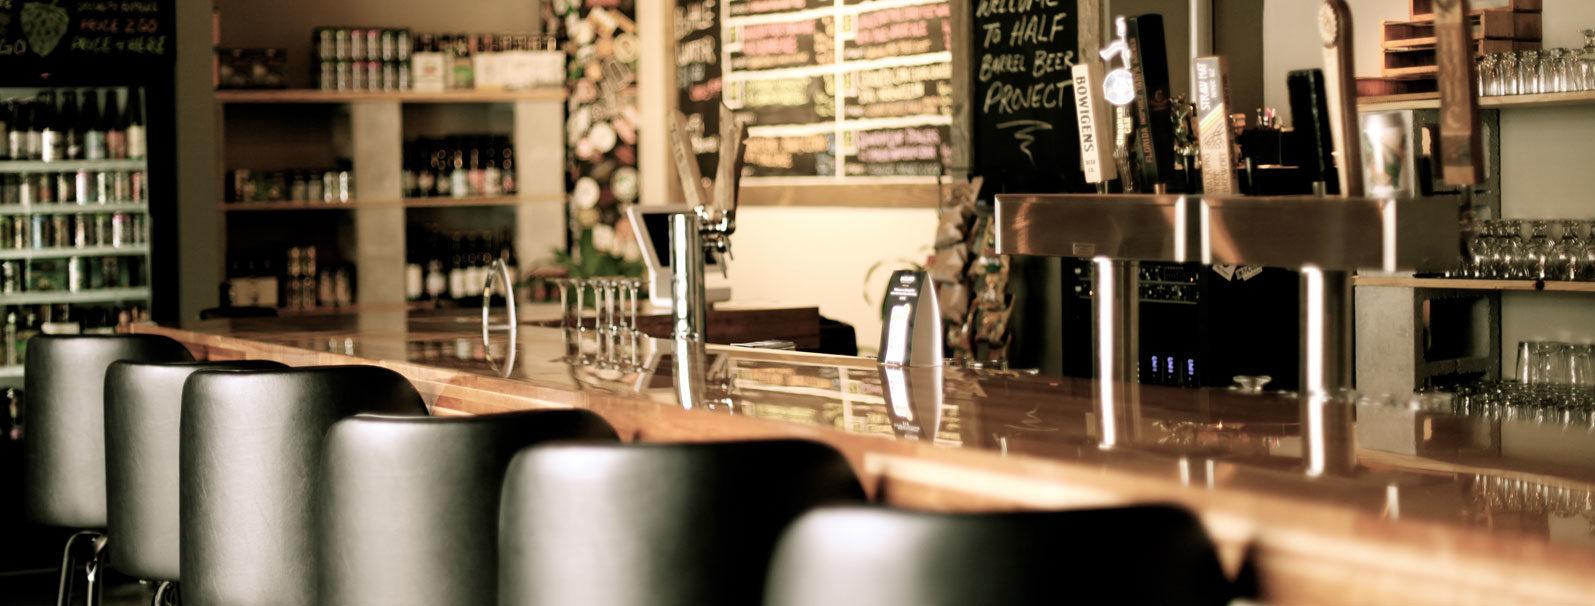 Half Barrel Beer Project – Craft Beer